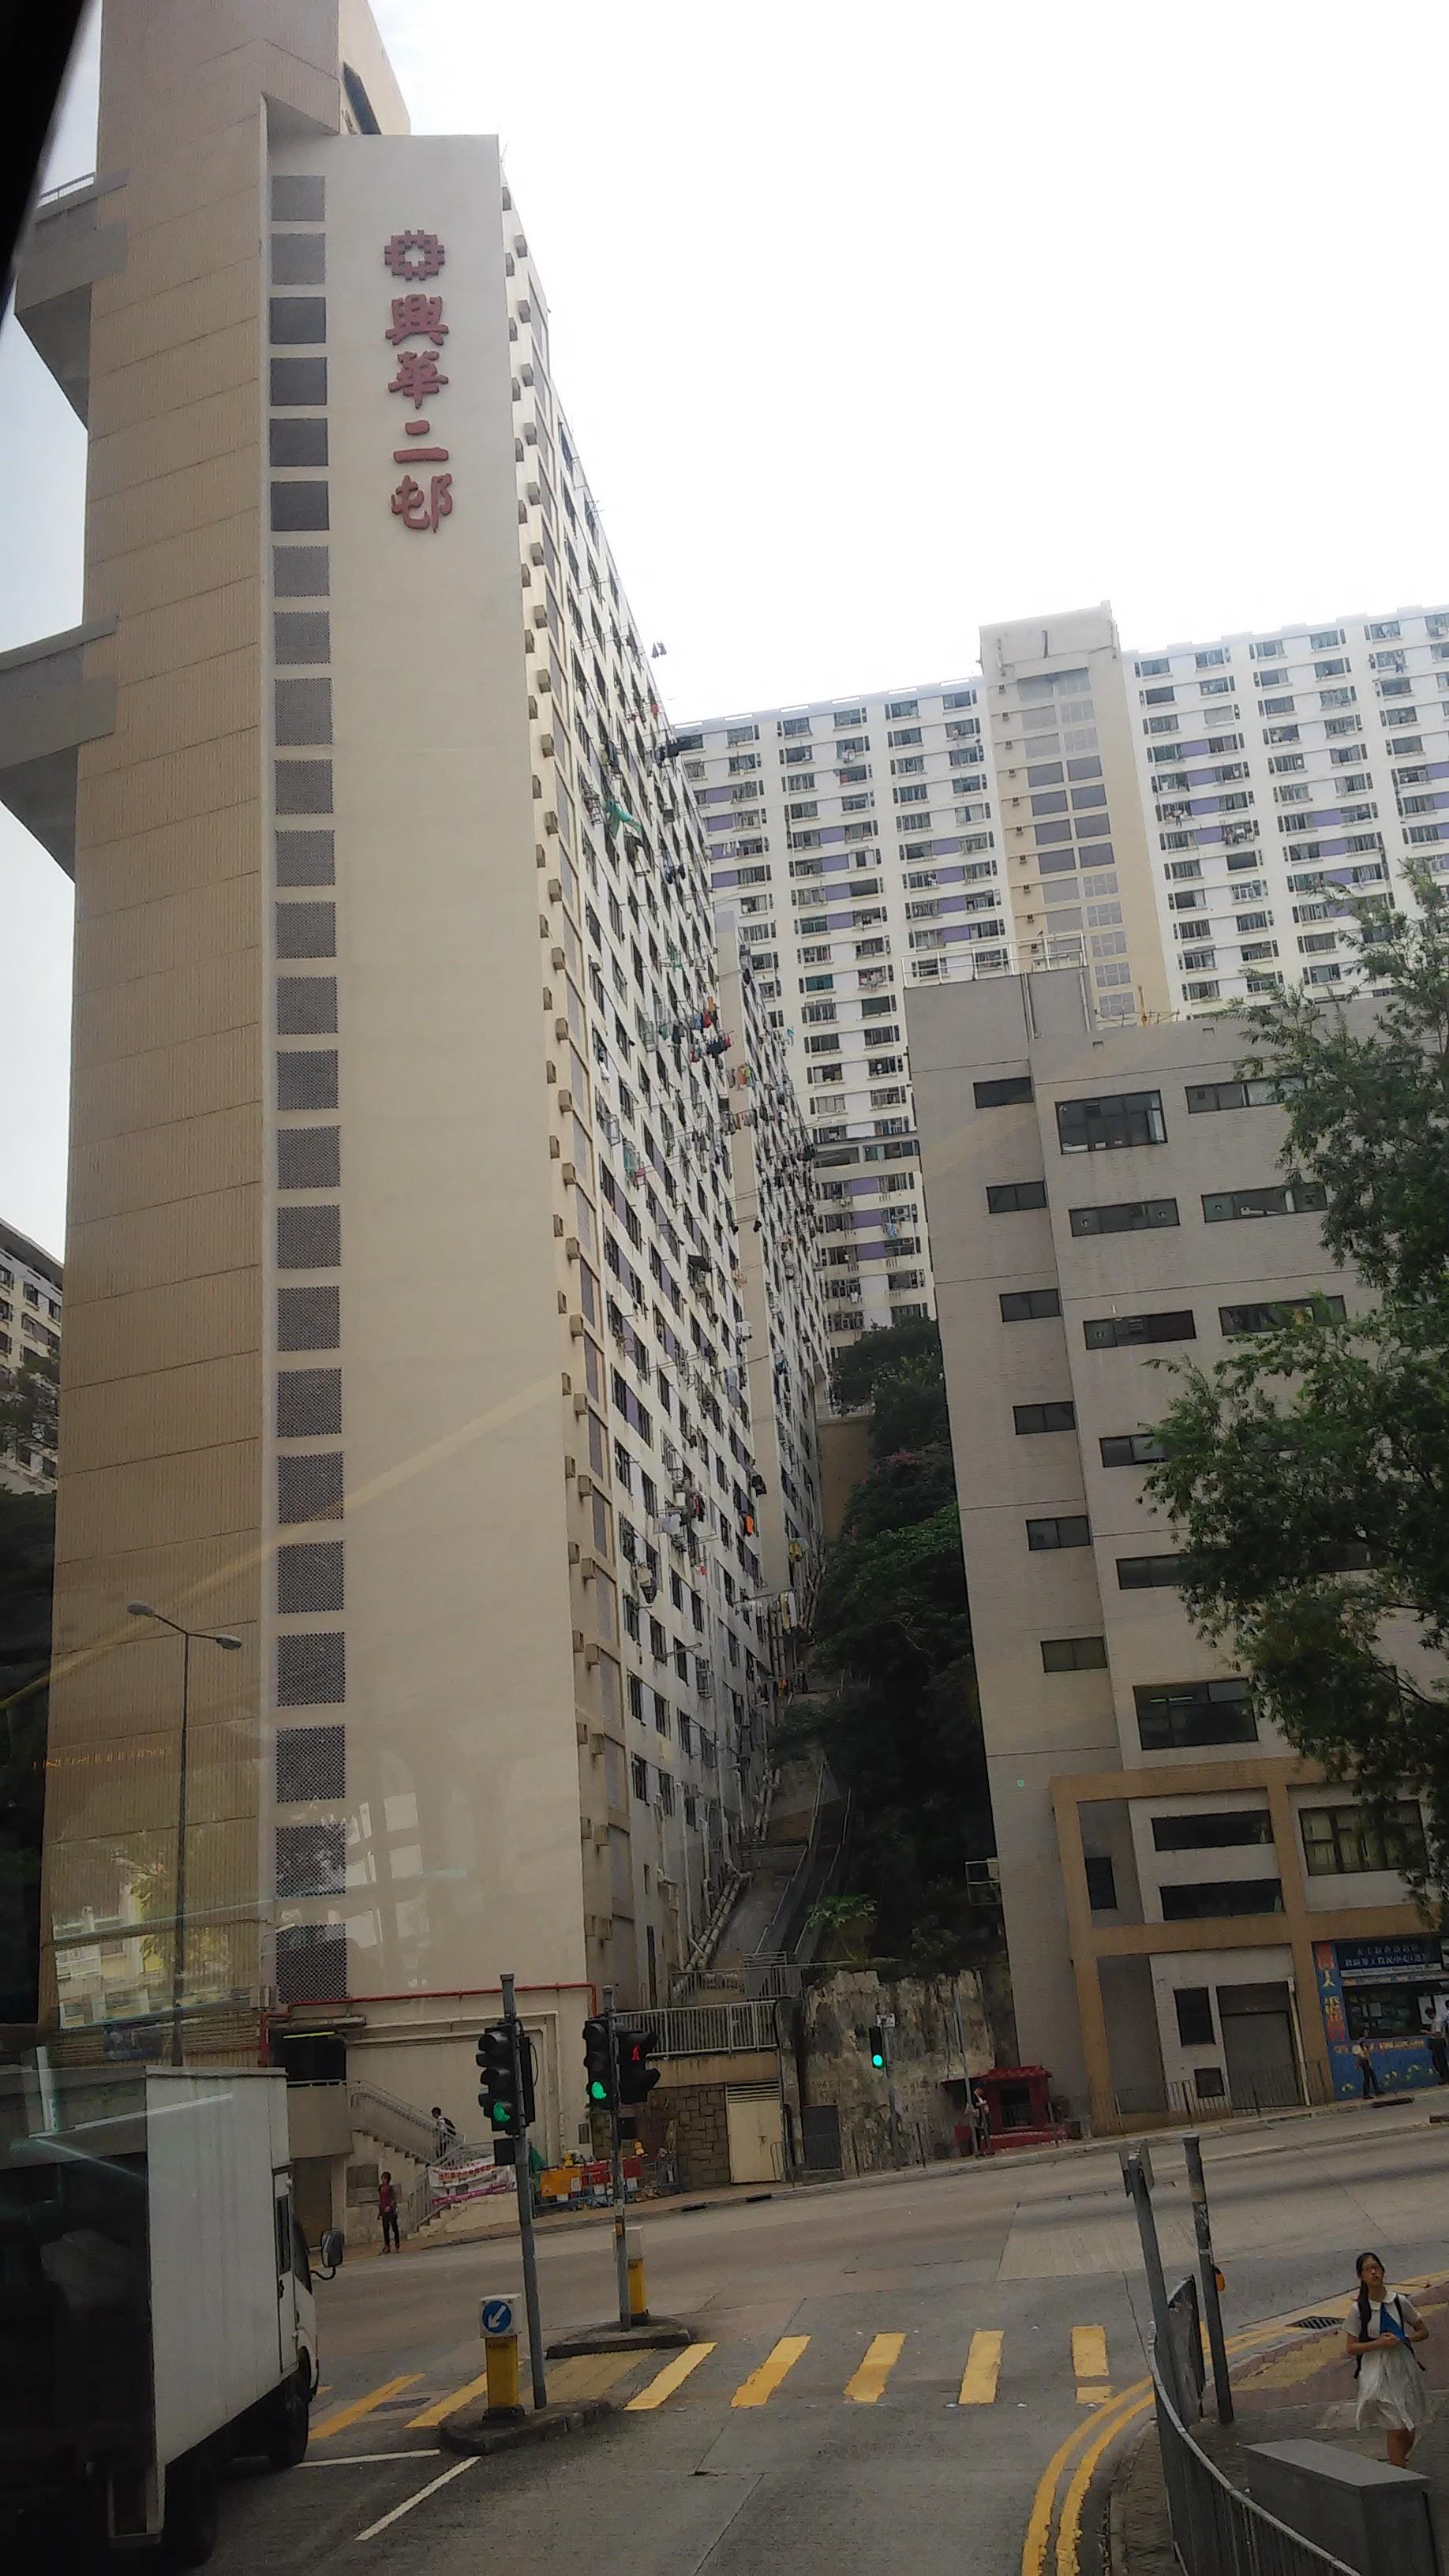 File:HK NWFBus 81 tour view 康民街 Hong Man Street view Hing Wah Estate Yu Hing House facade Oct-2014 LG2.jpg - Wikimedia Commons